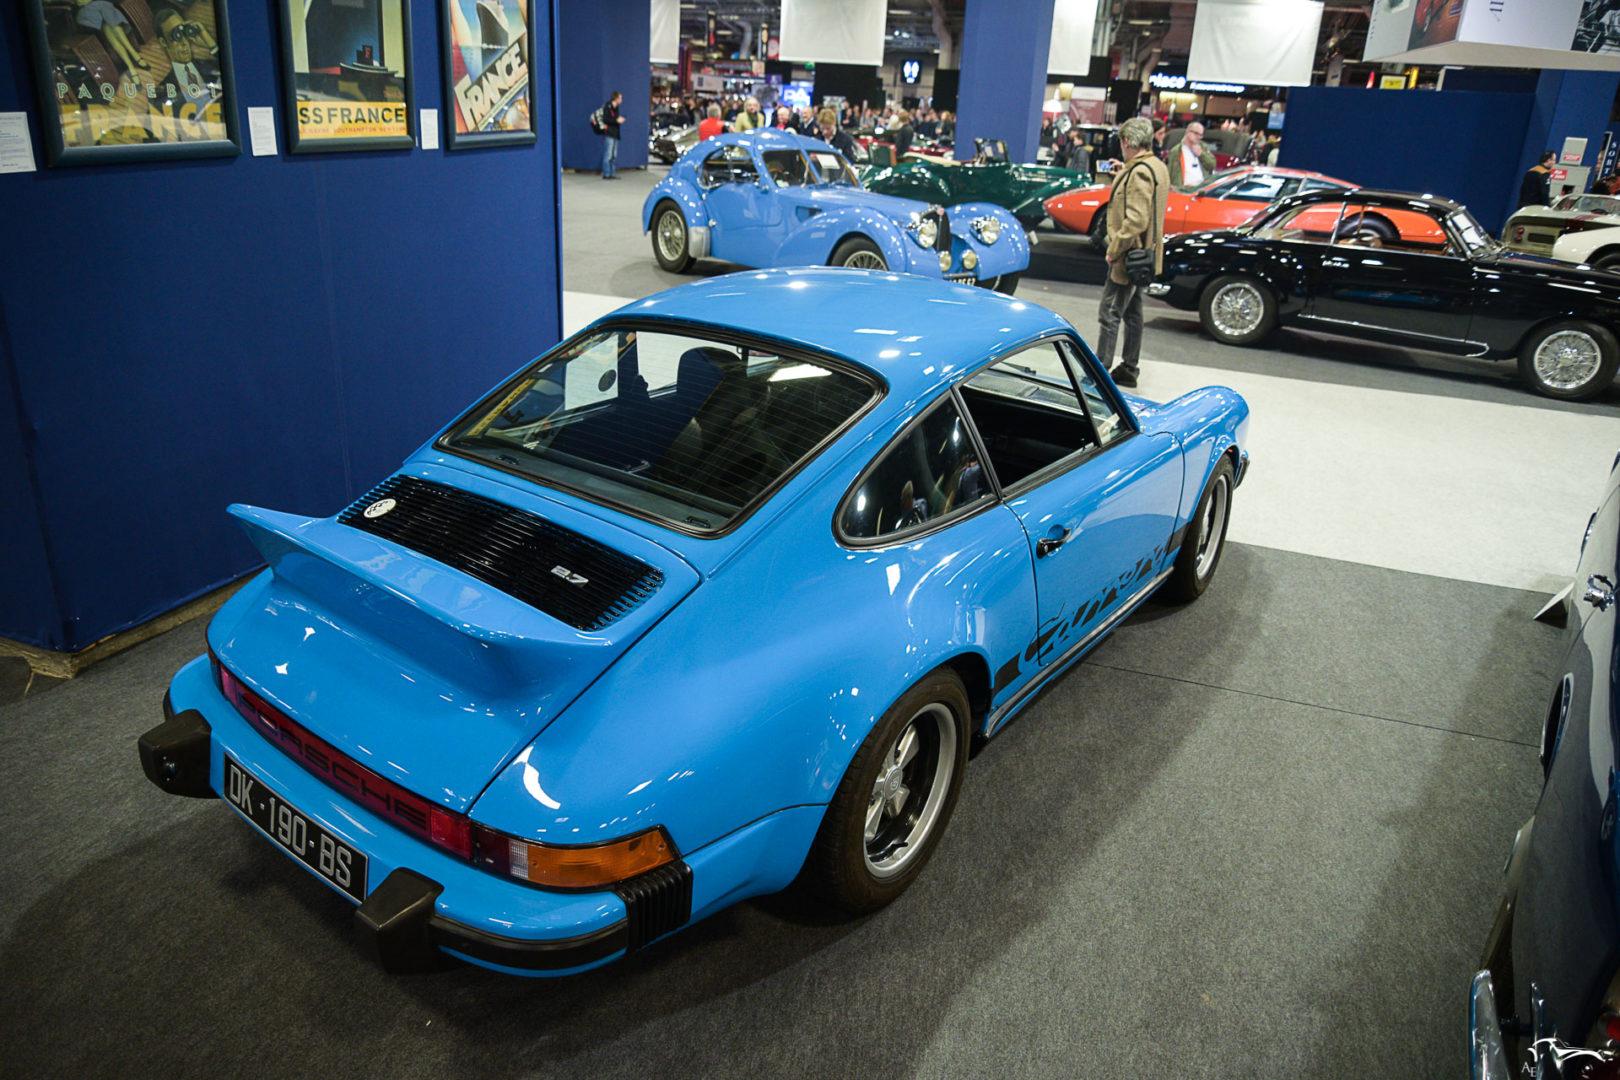 Porsche 911 & Bugatti Type 57